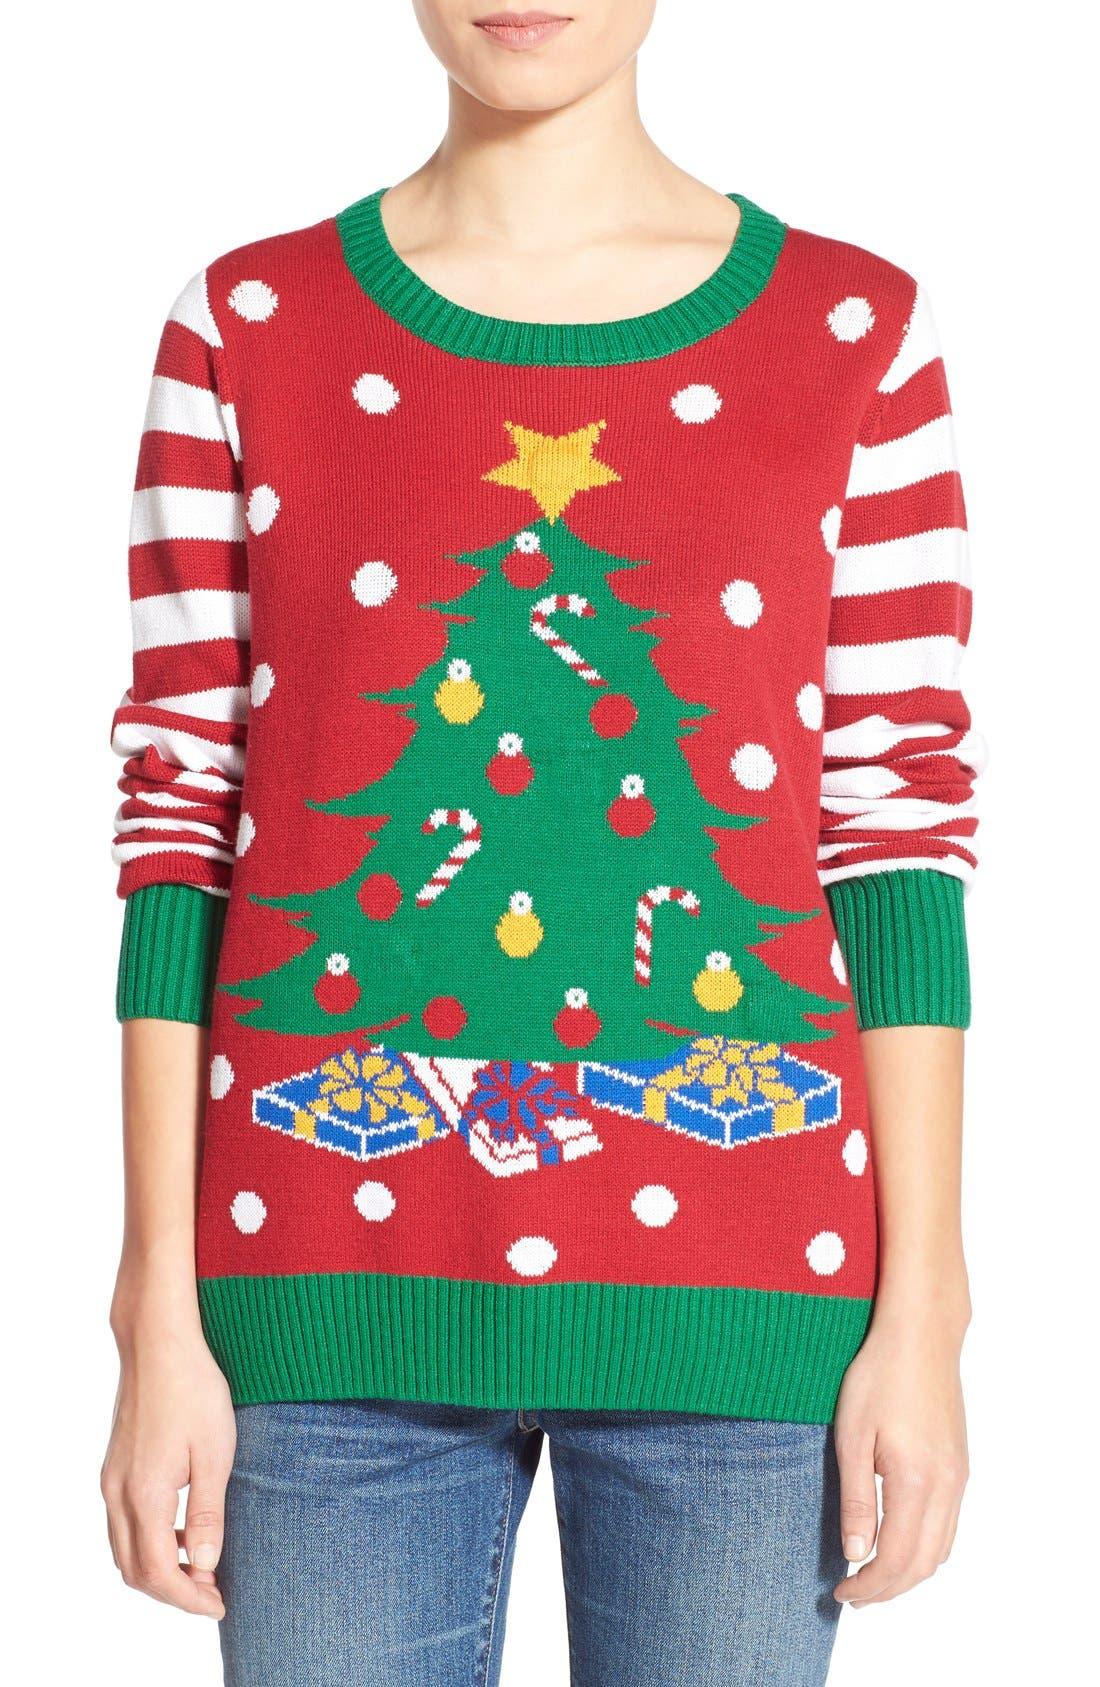 Main Image - Ugly Christmas Sweater Light-Up Christmas Tree Sweater